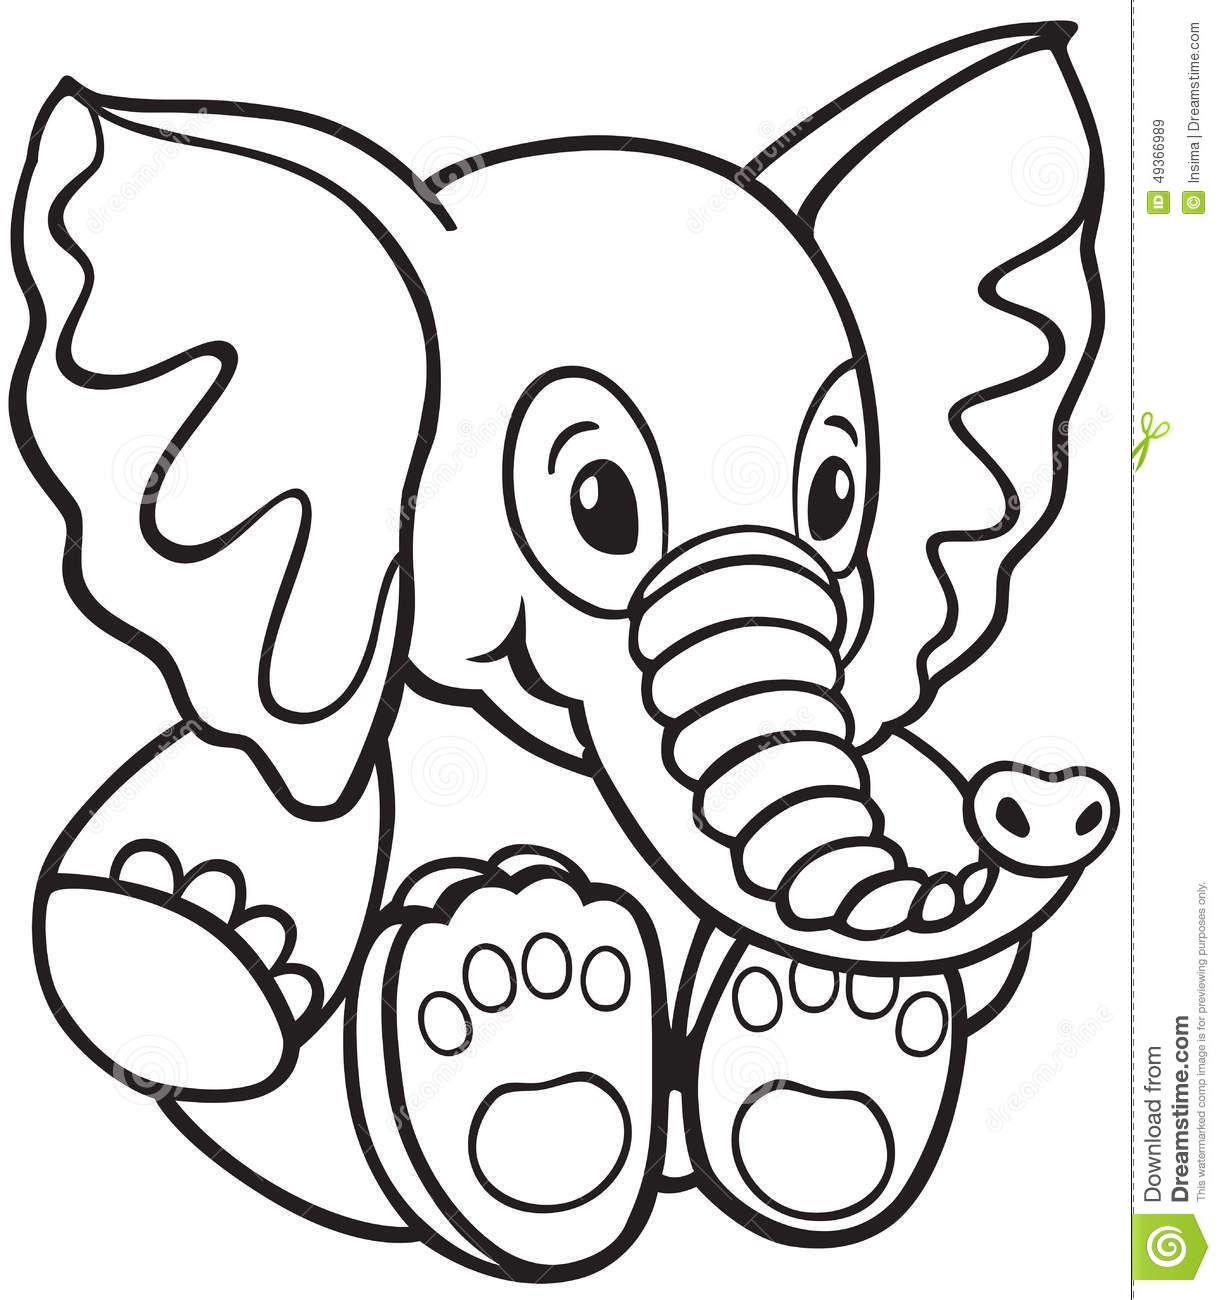 1221x1300 Elephant Toy Soft Black White Cartoon Image Little Kids